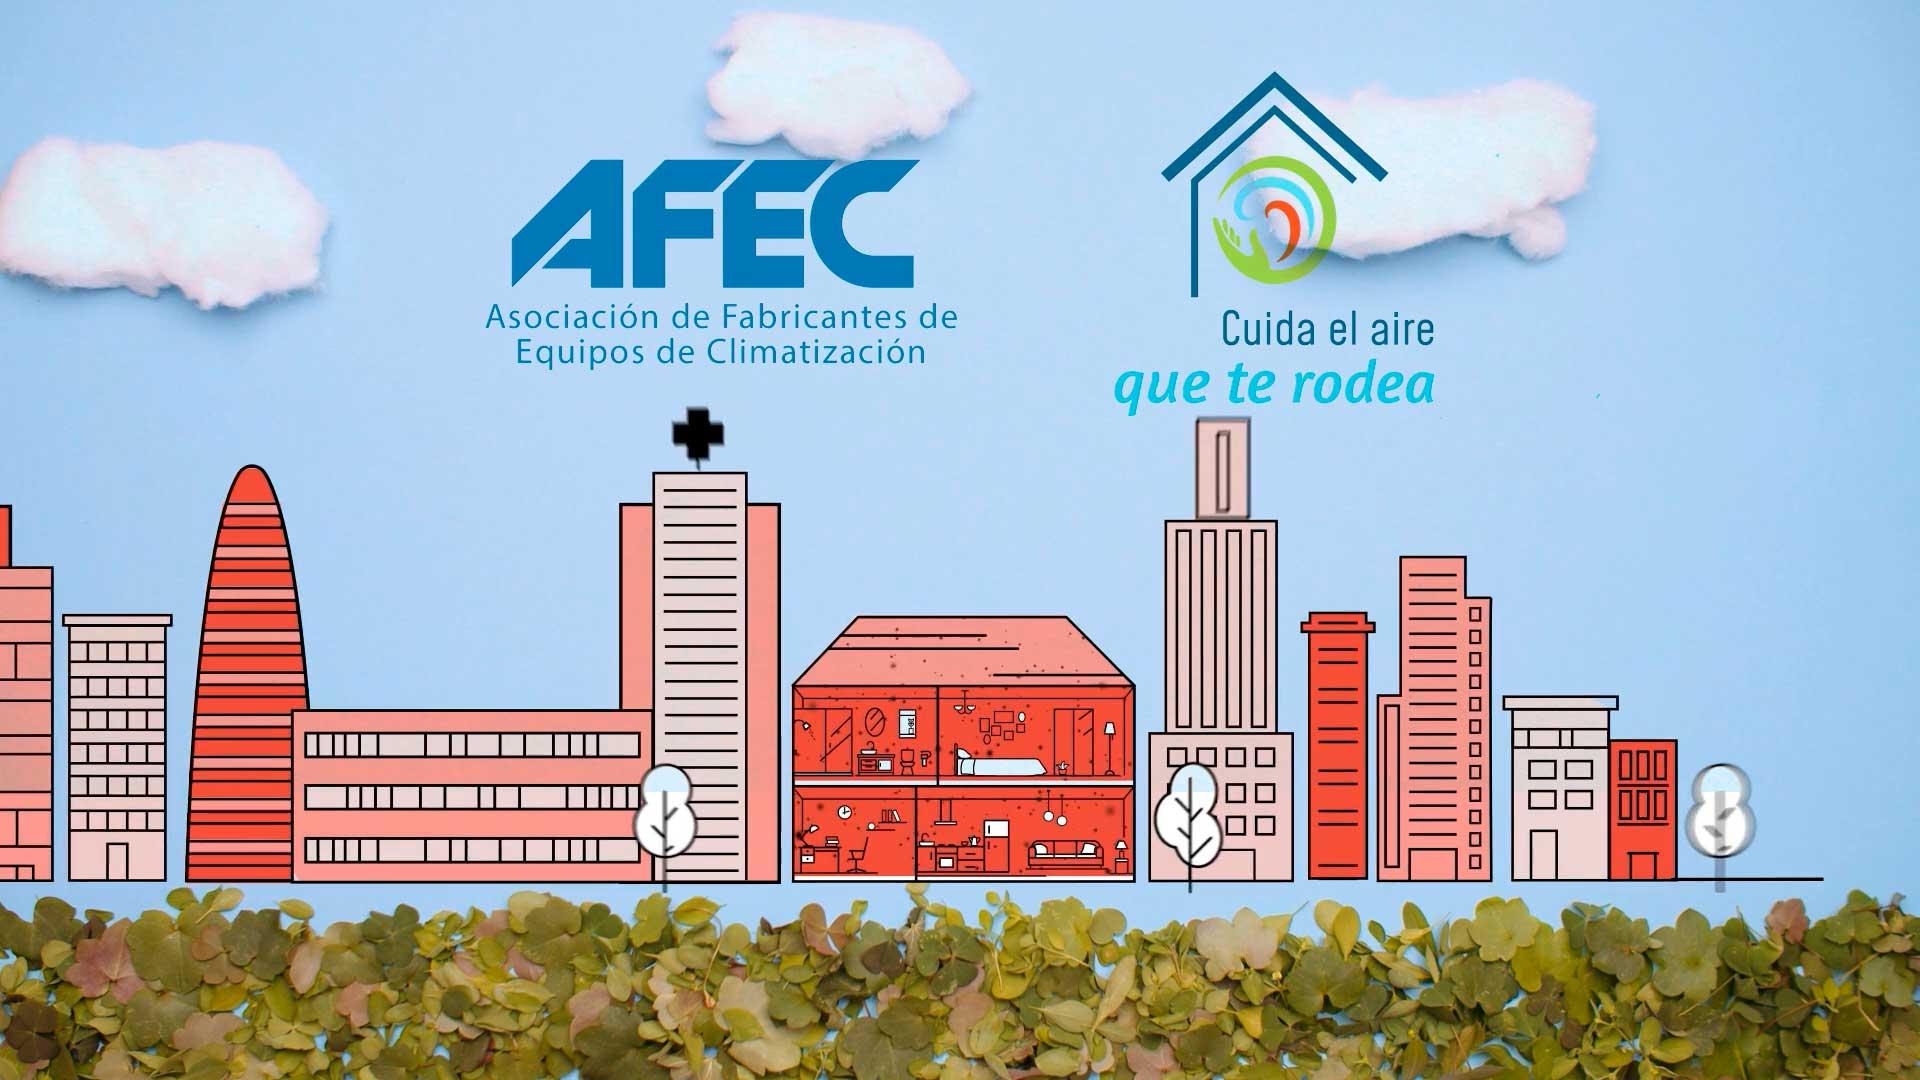 Campaña AFEC. Cuida el aire que te rodea.